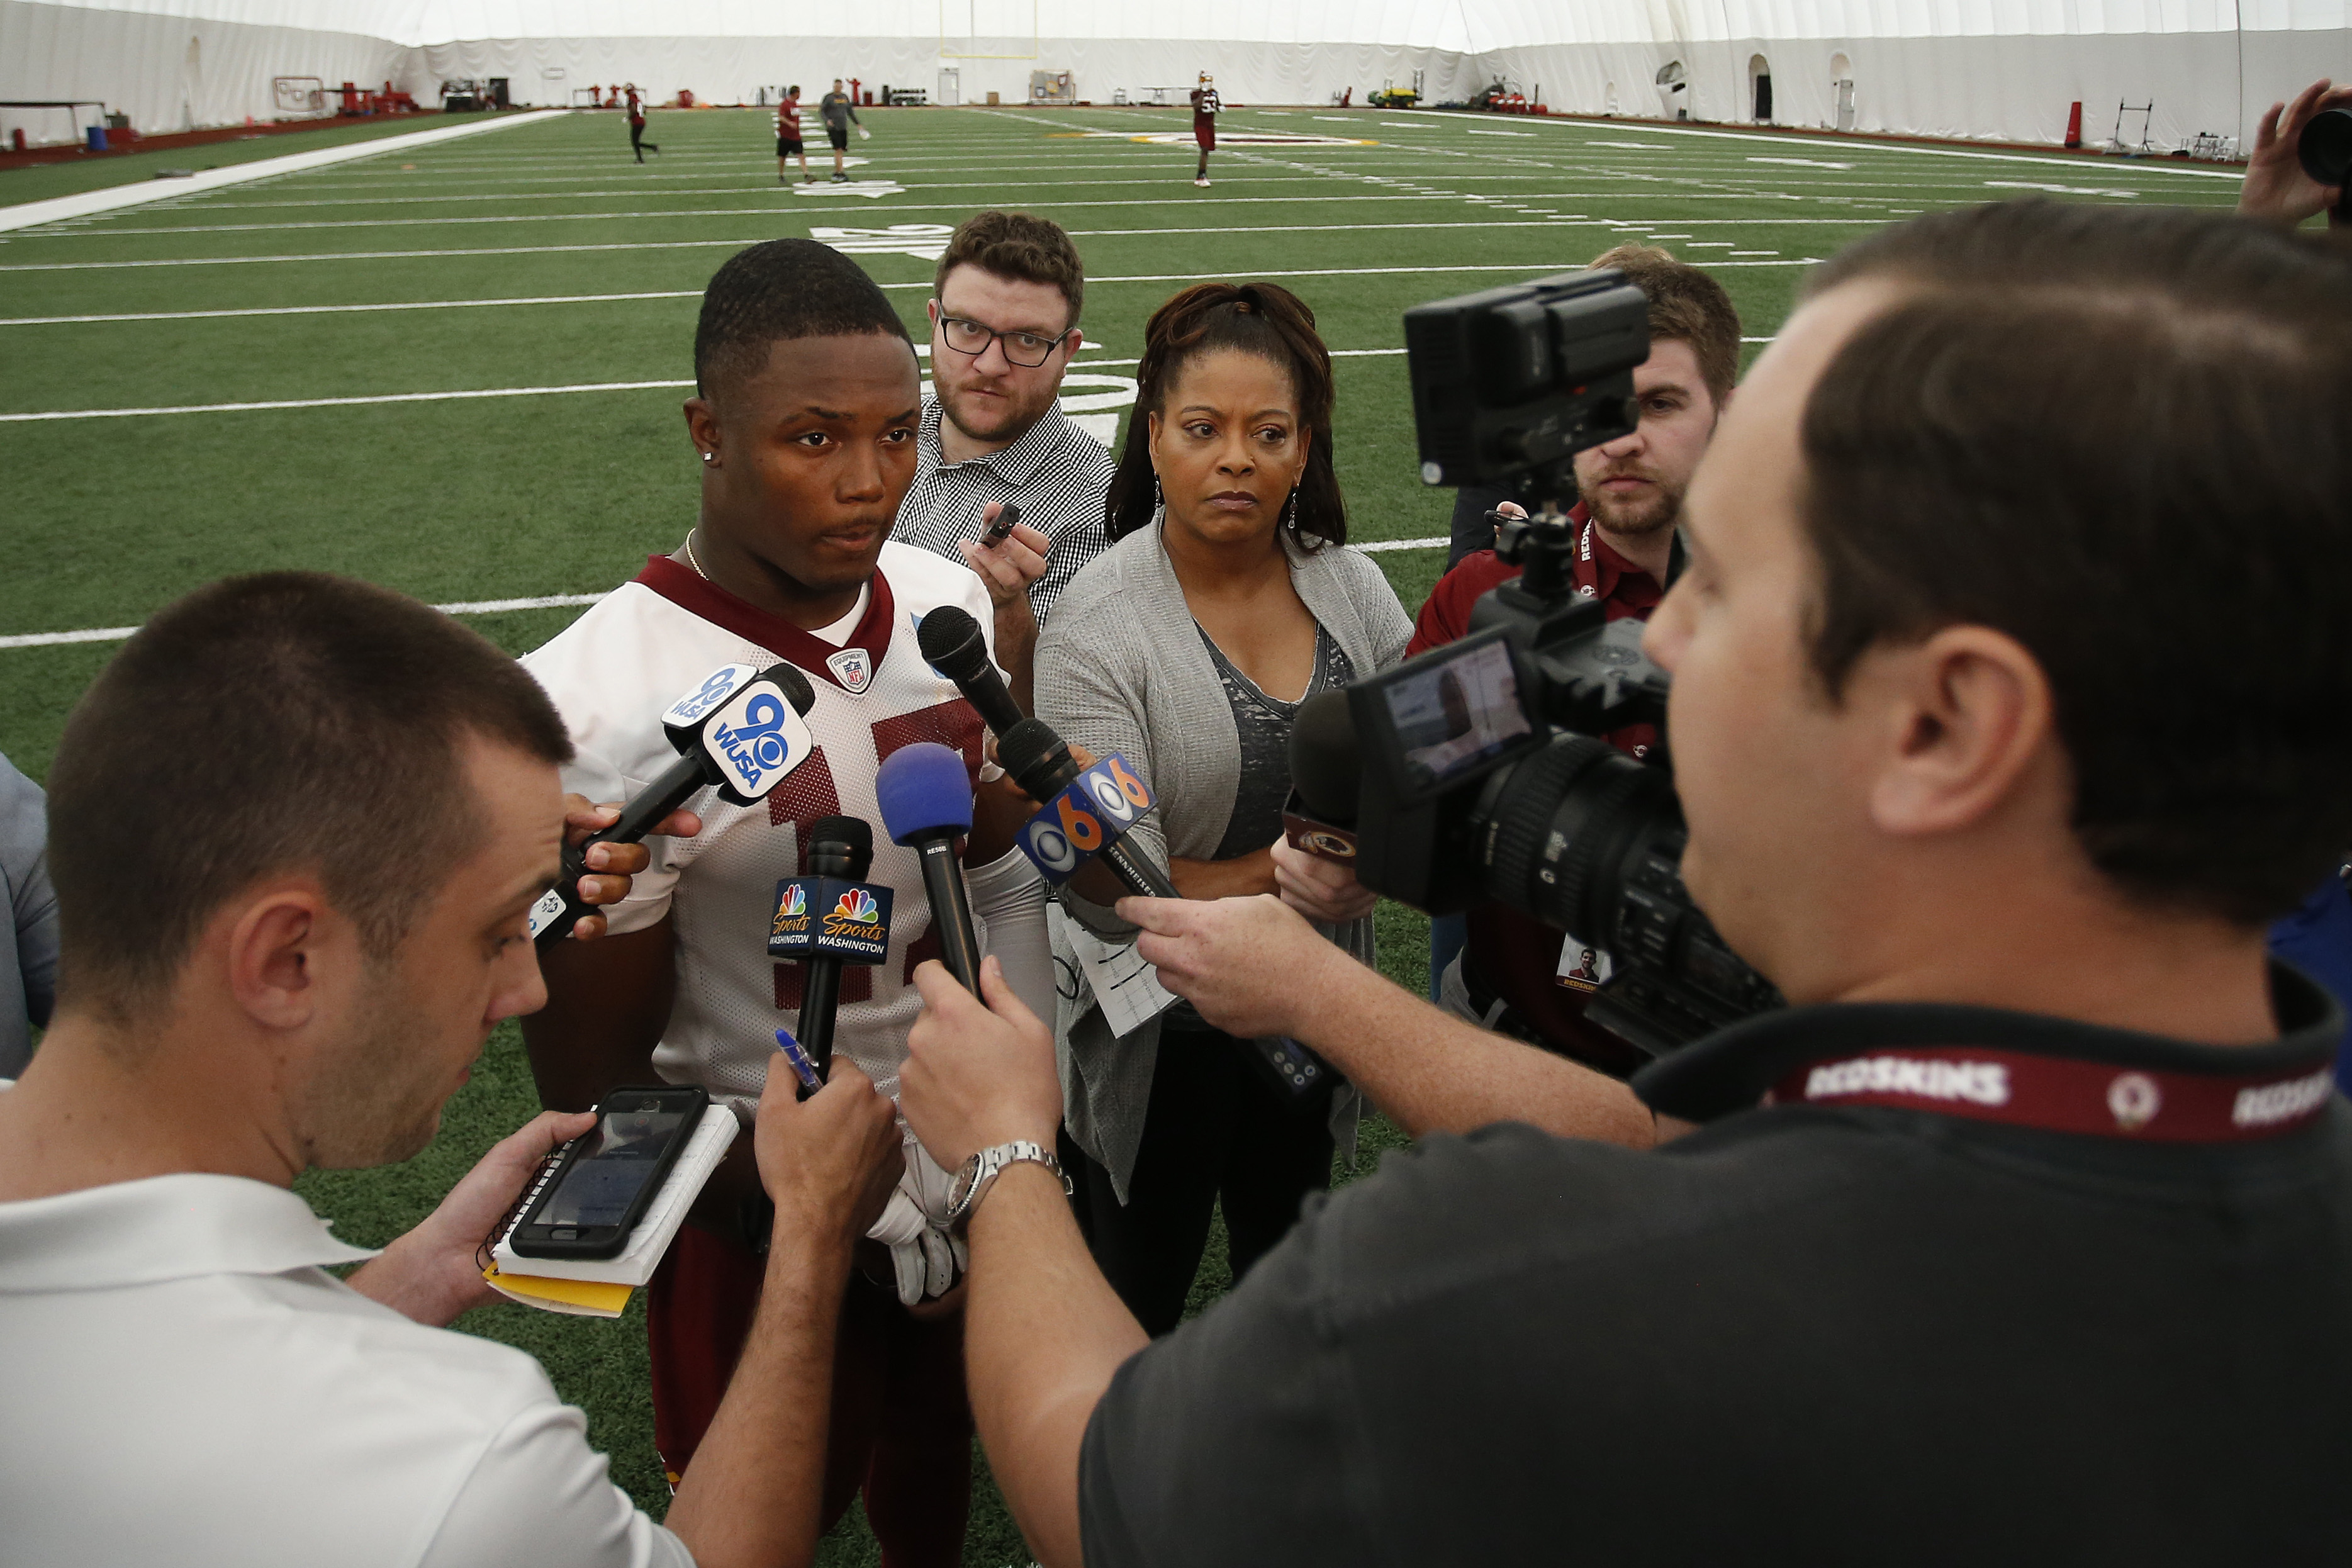 NFL: Washington Redskins-Rookie Minicamp